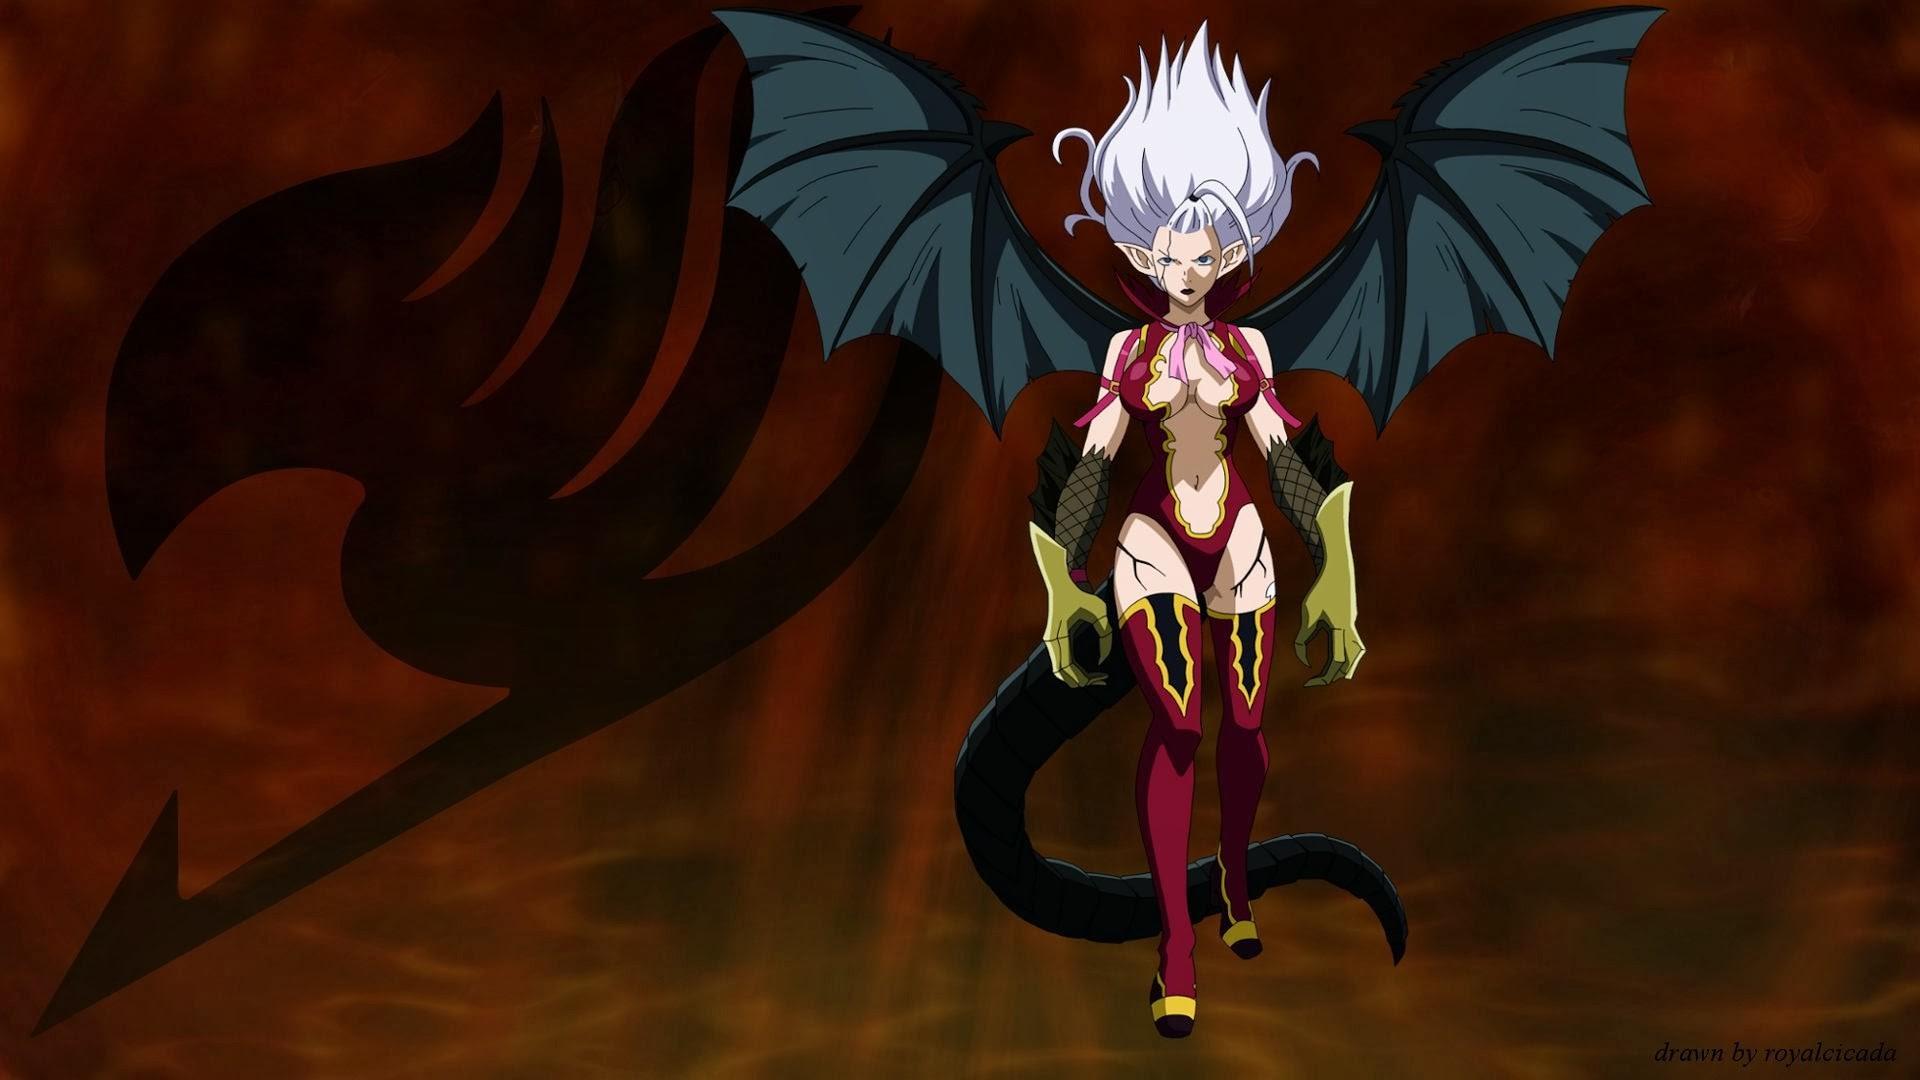 Res: 1920x1080, mirajane strauss satan soul wallpaper hd fairy tail anime demon girl wings   a716.